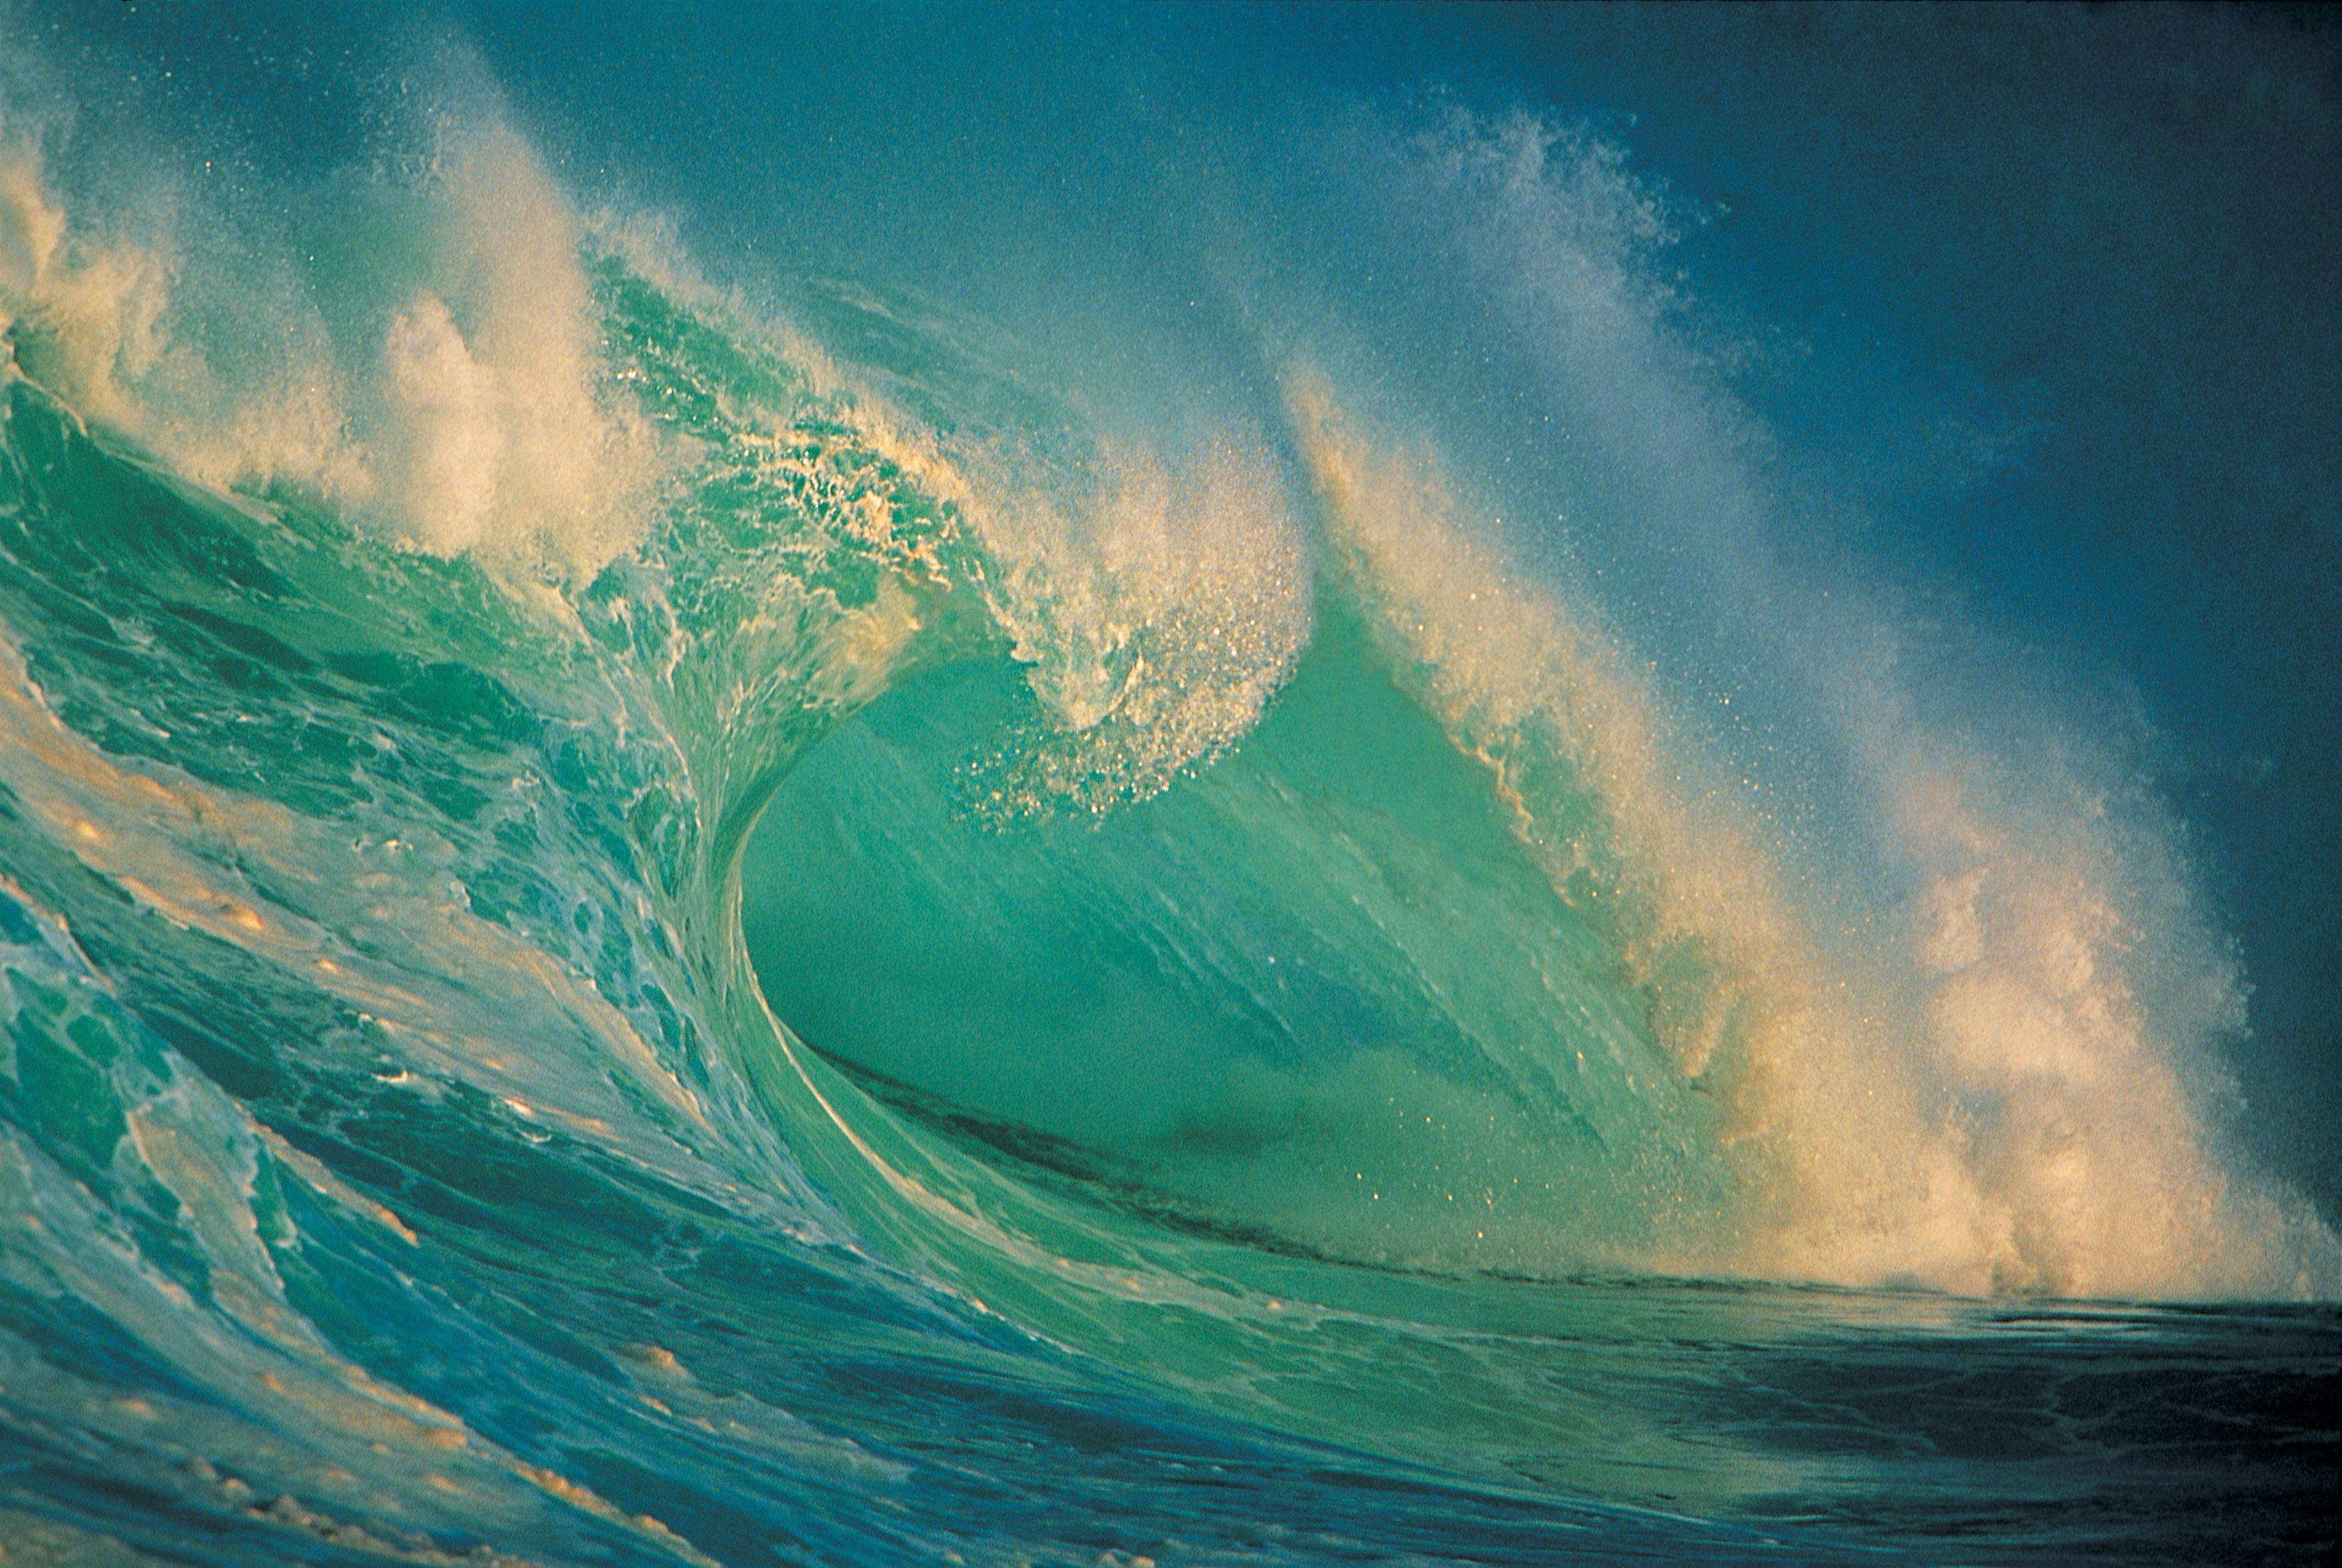 Waves photo